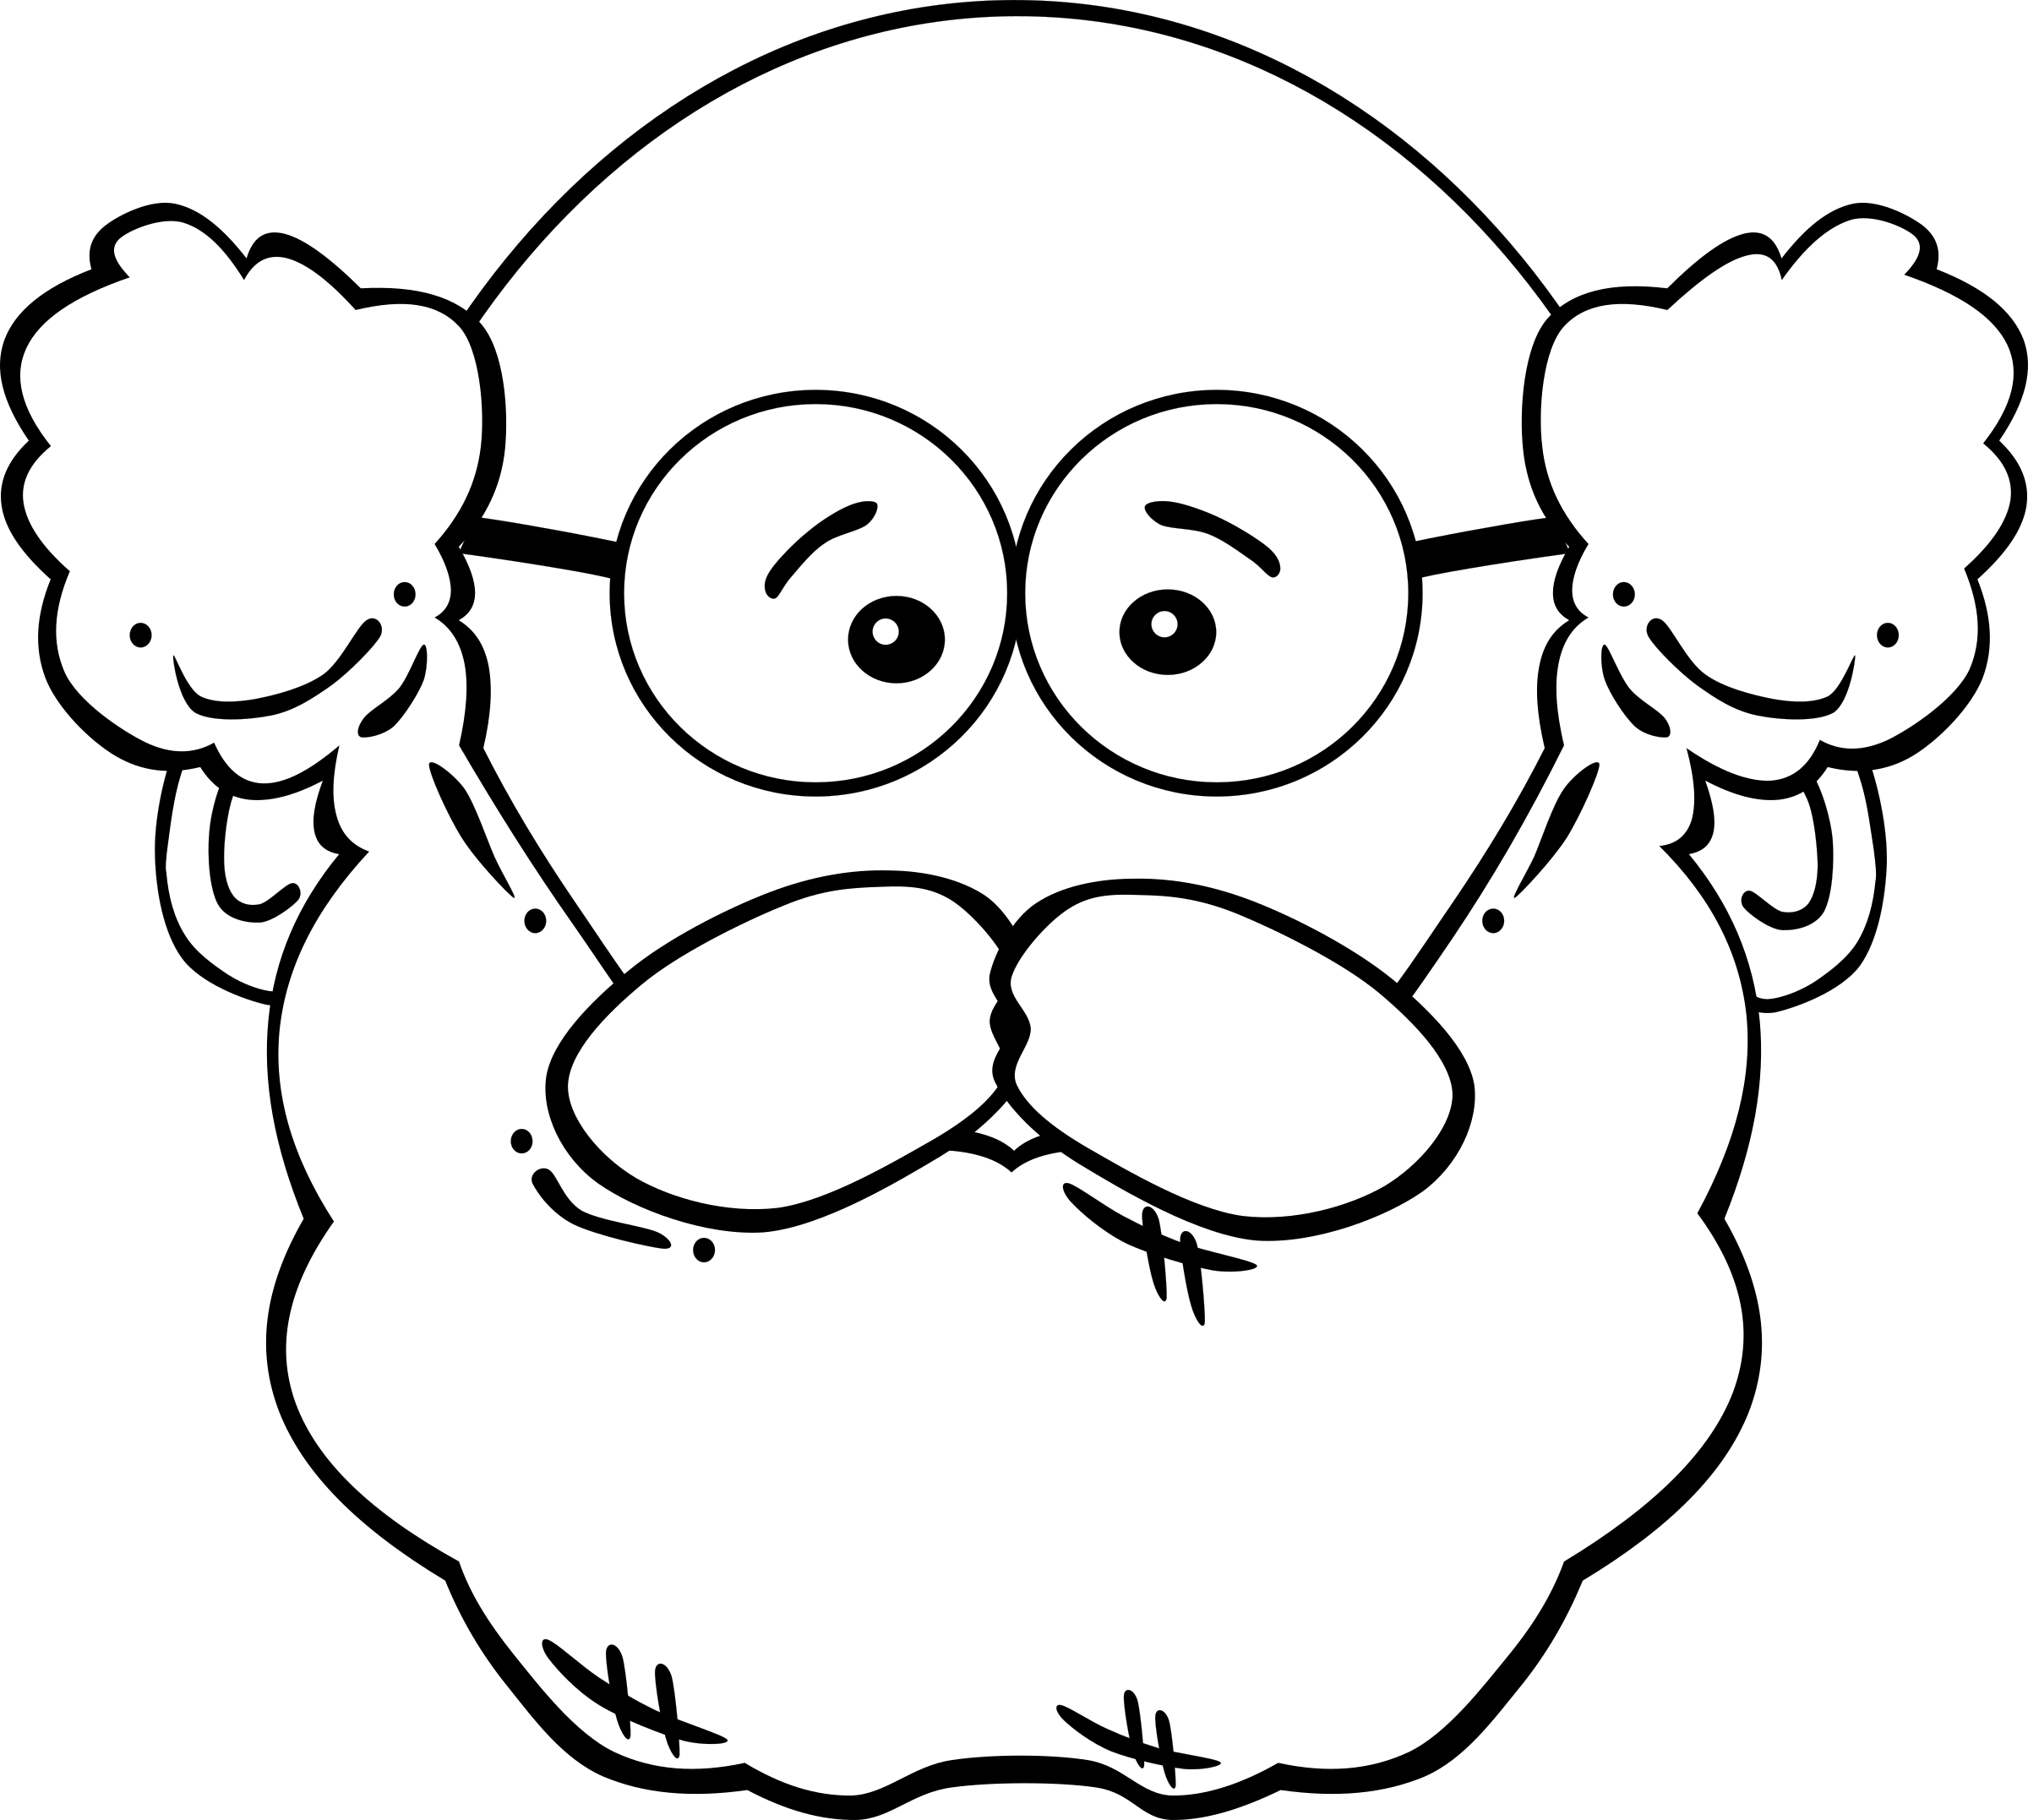 png freeuse Beard clipart outline. Man face cartoon big